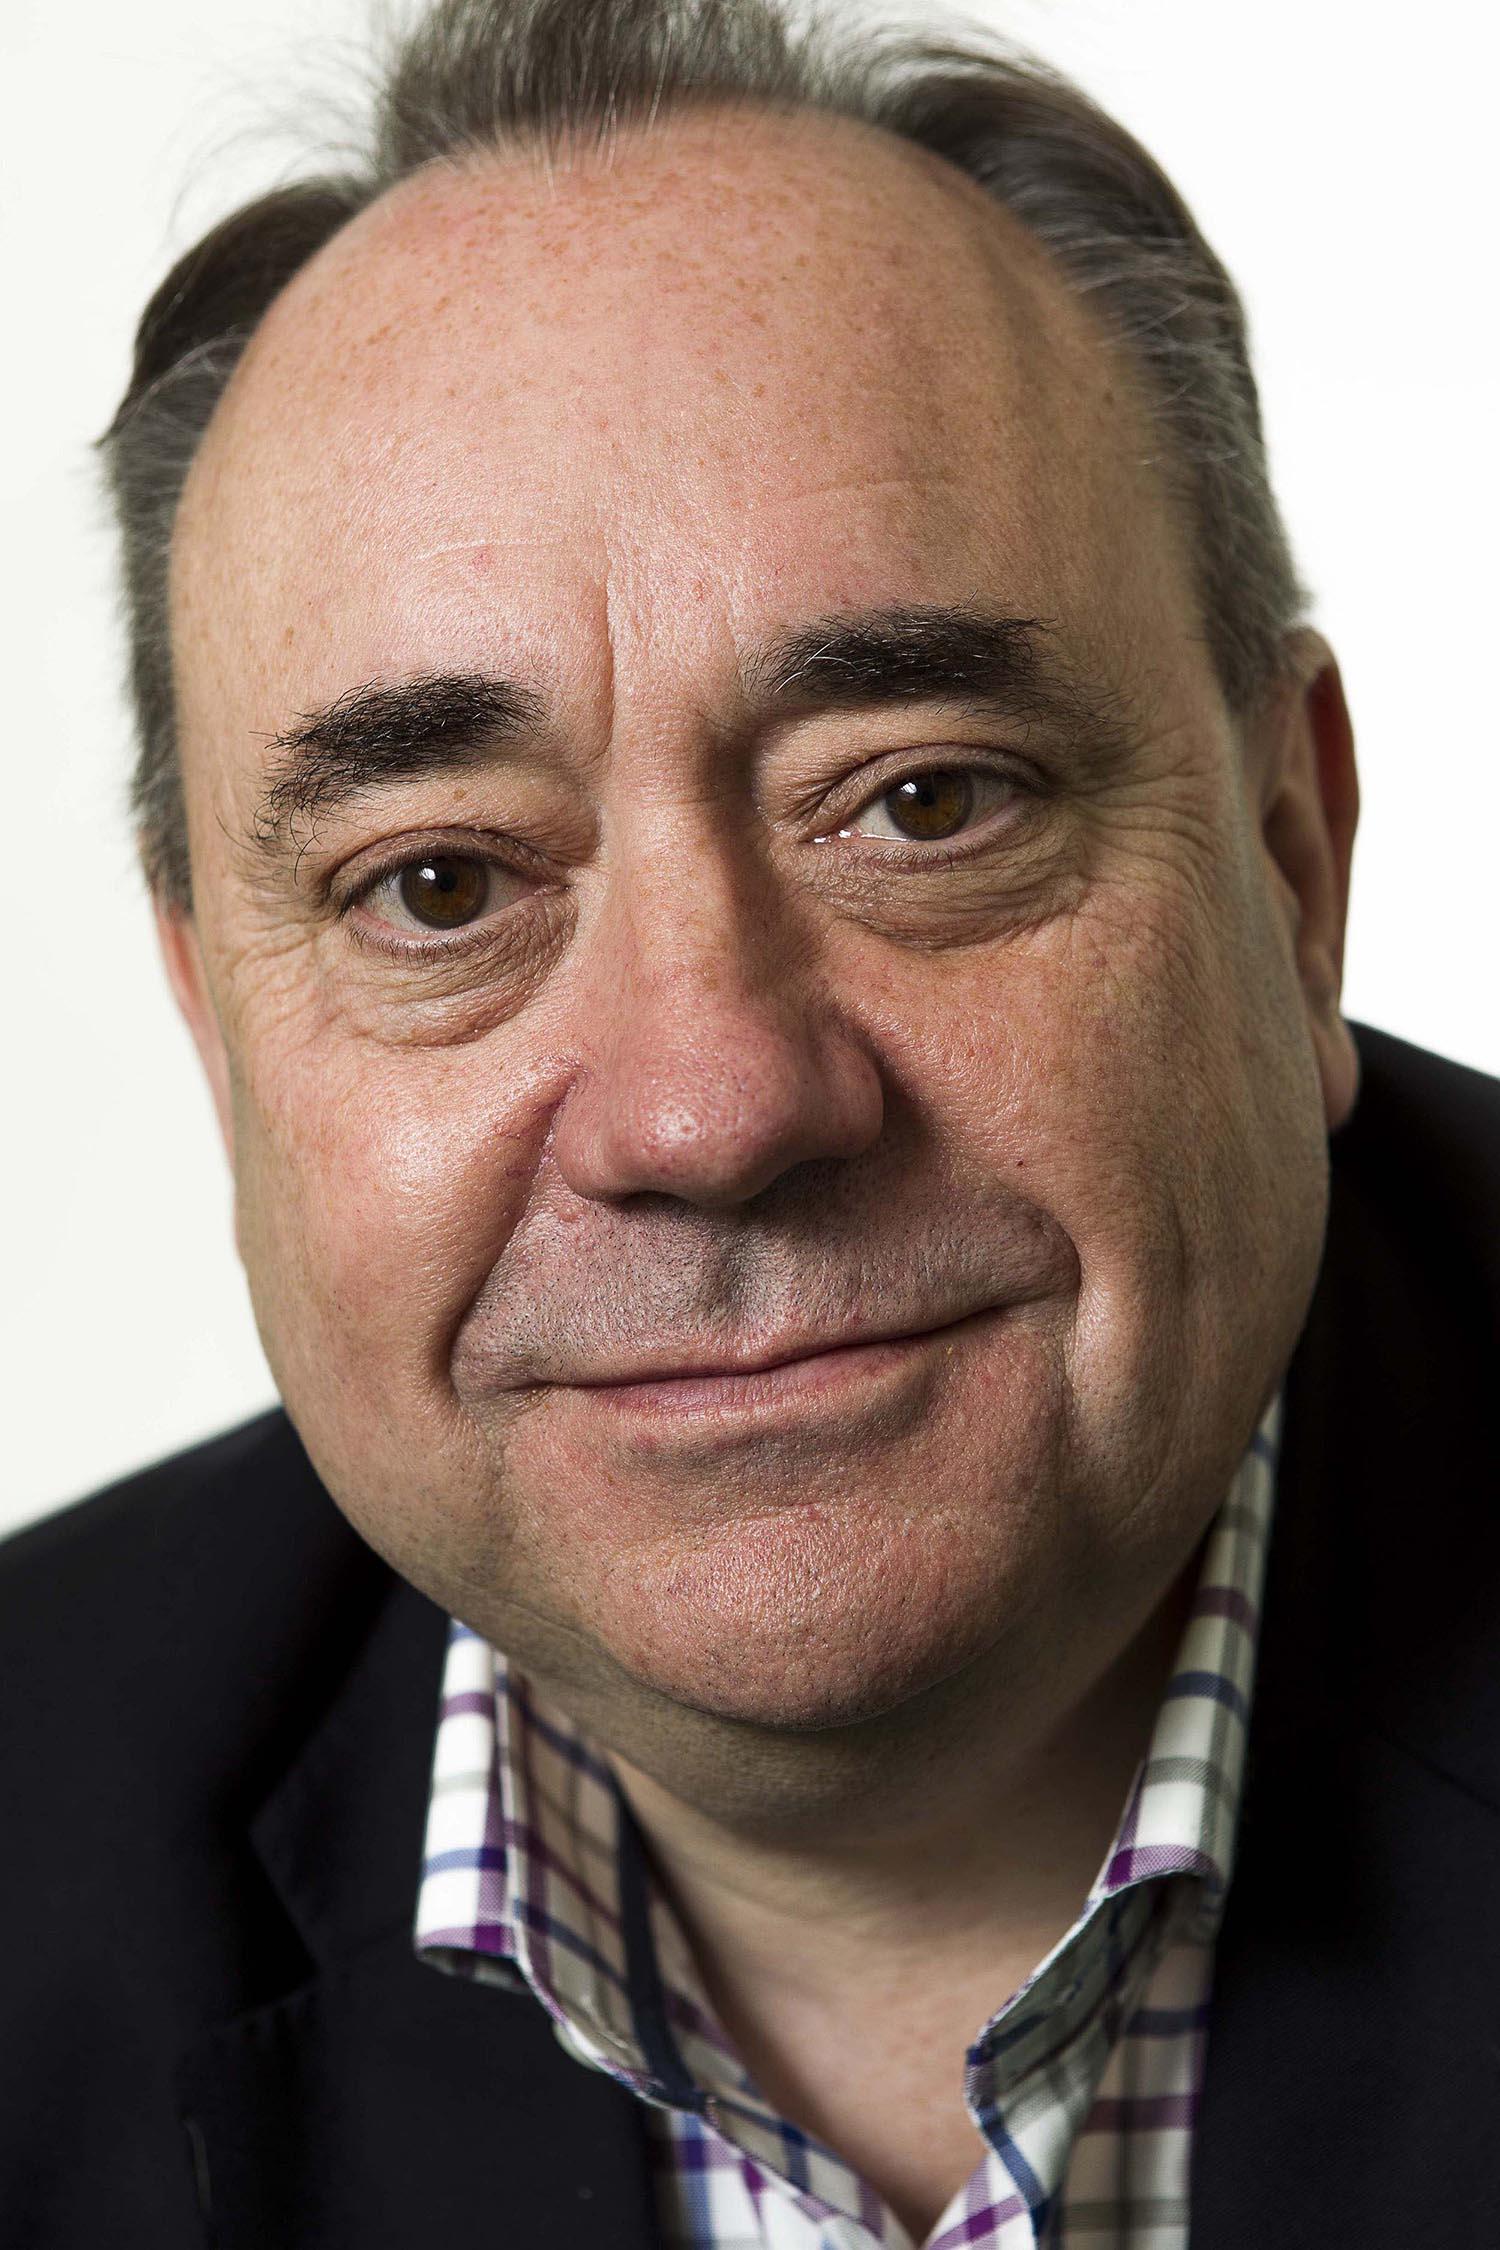 Alex Salmond at Hay Festival